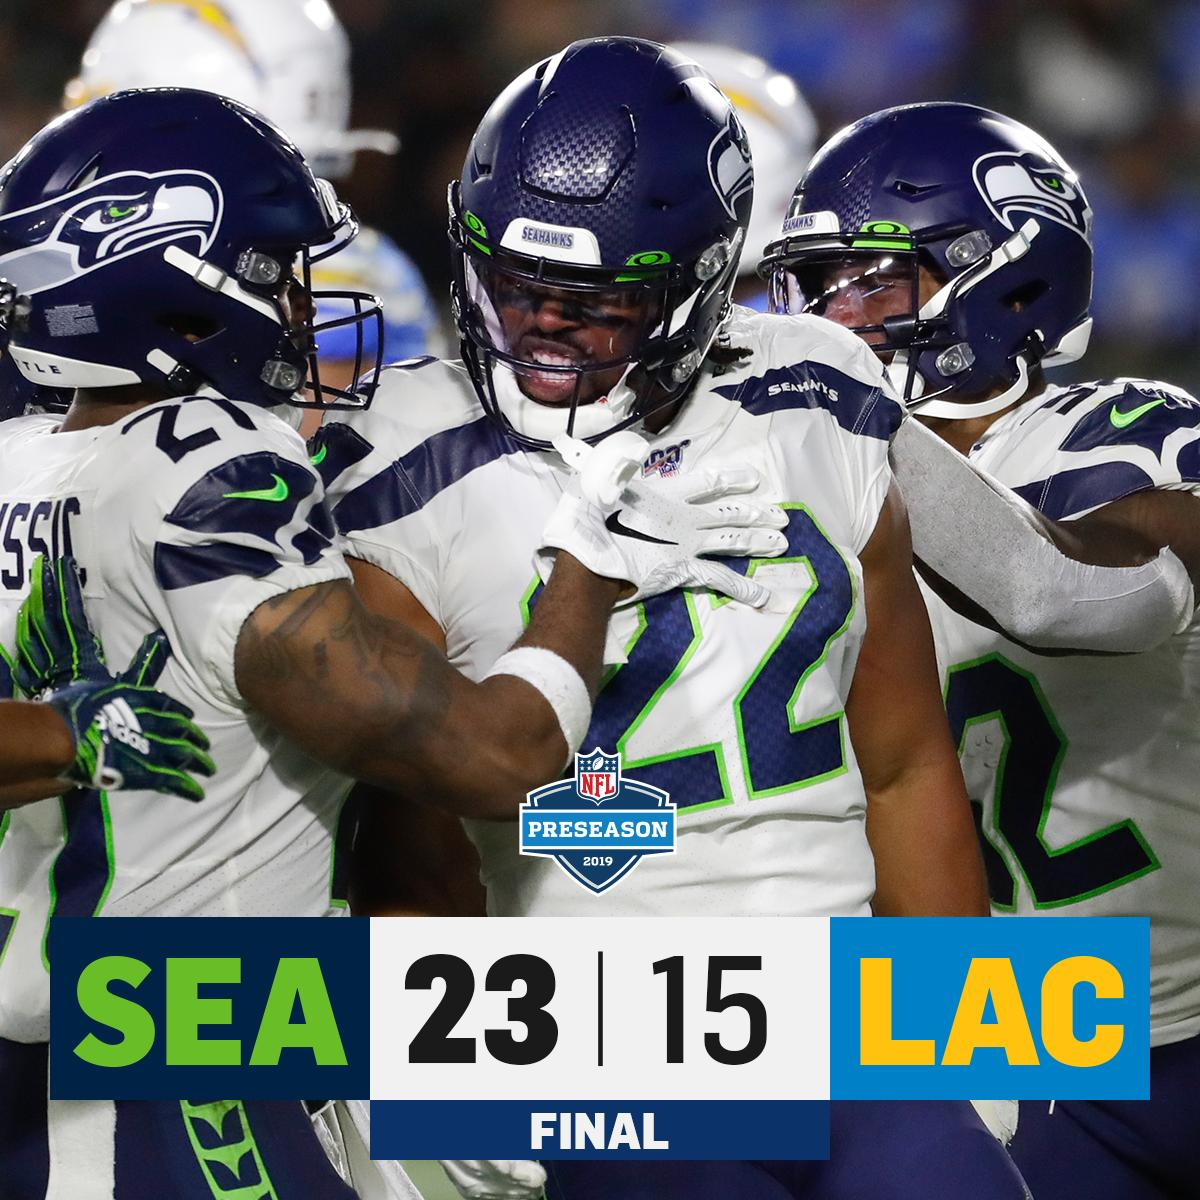 RT @NFL: FINAL: @Seahawks wrap up Preseason Week 3 with a win! #SEAvsLAC https://t.co/wn3pQb6Y6S